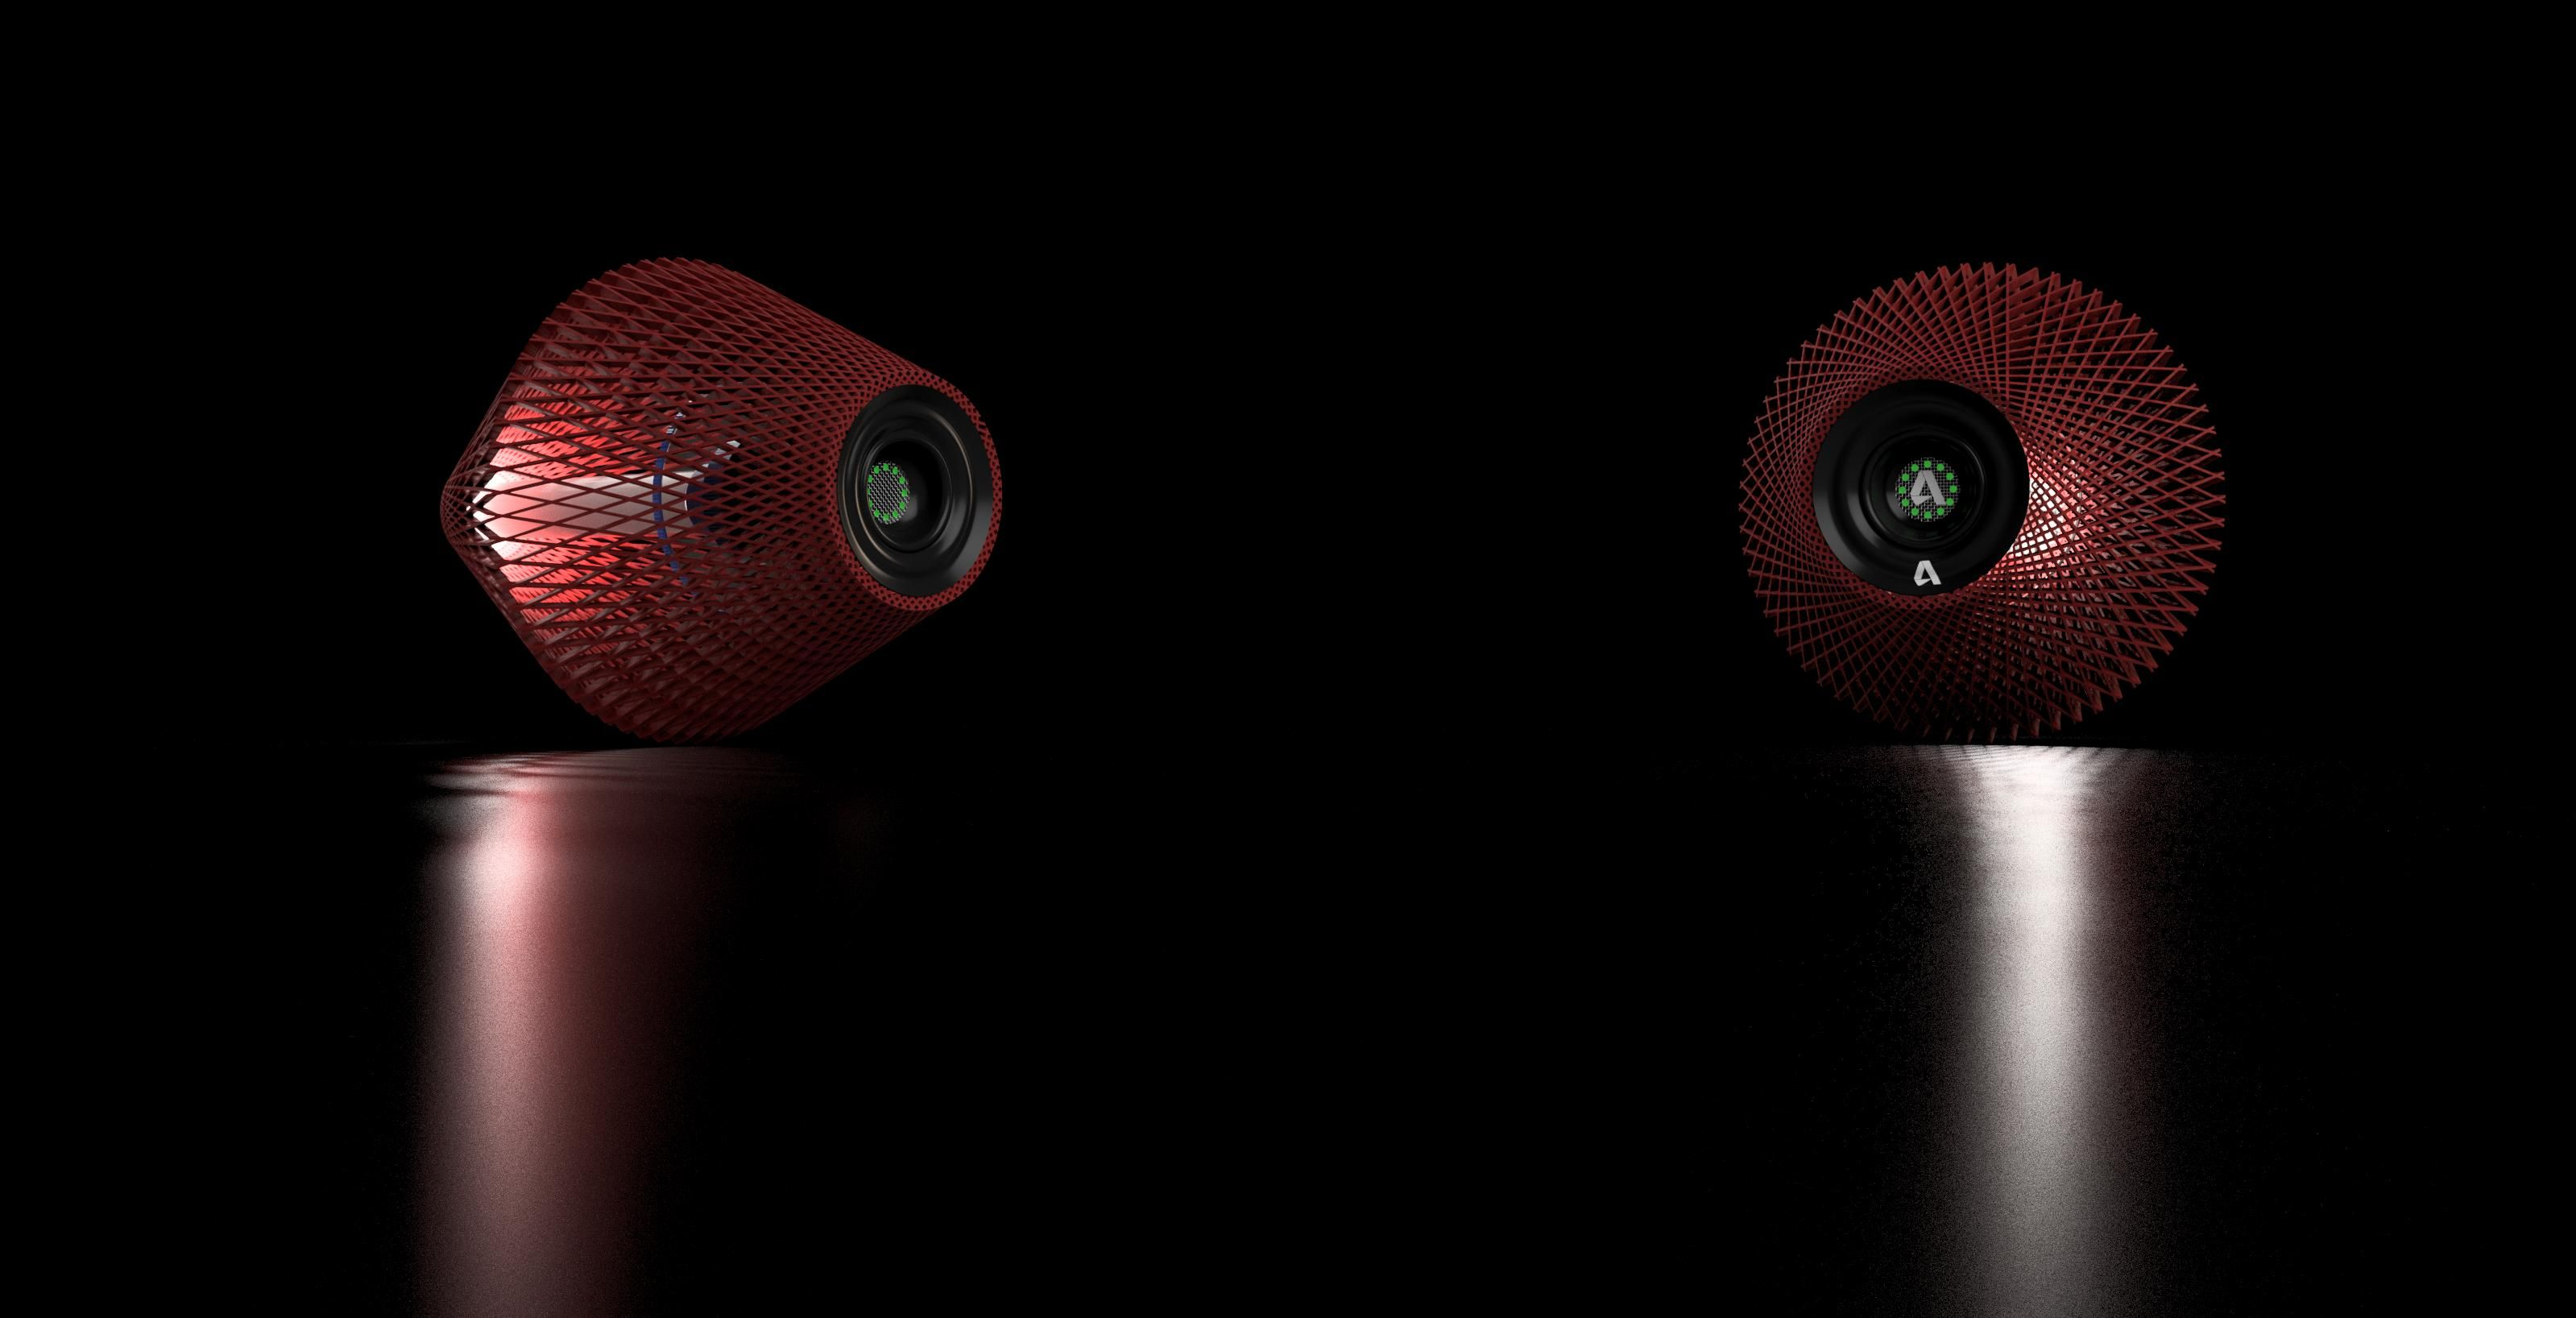 Earbud-completlynewone-02-v2-009-3500-3500